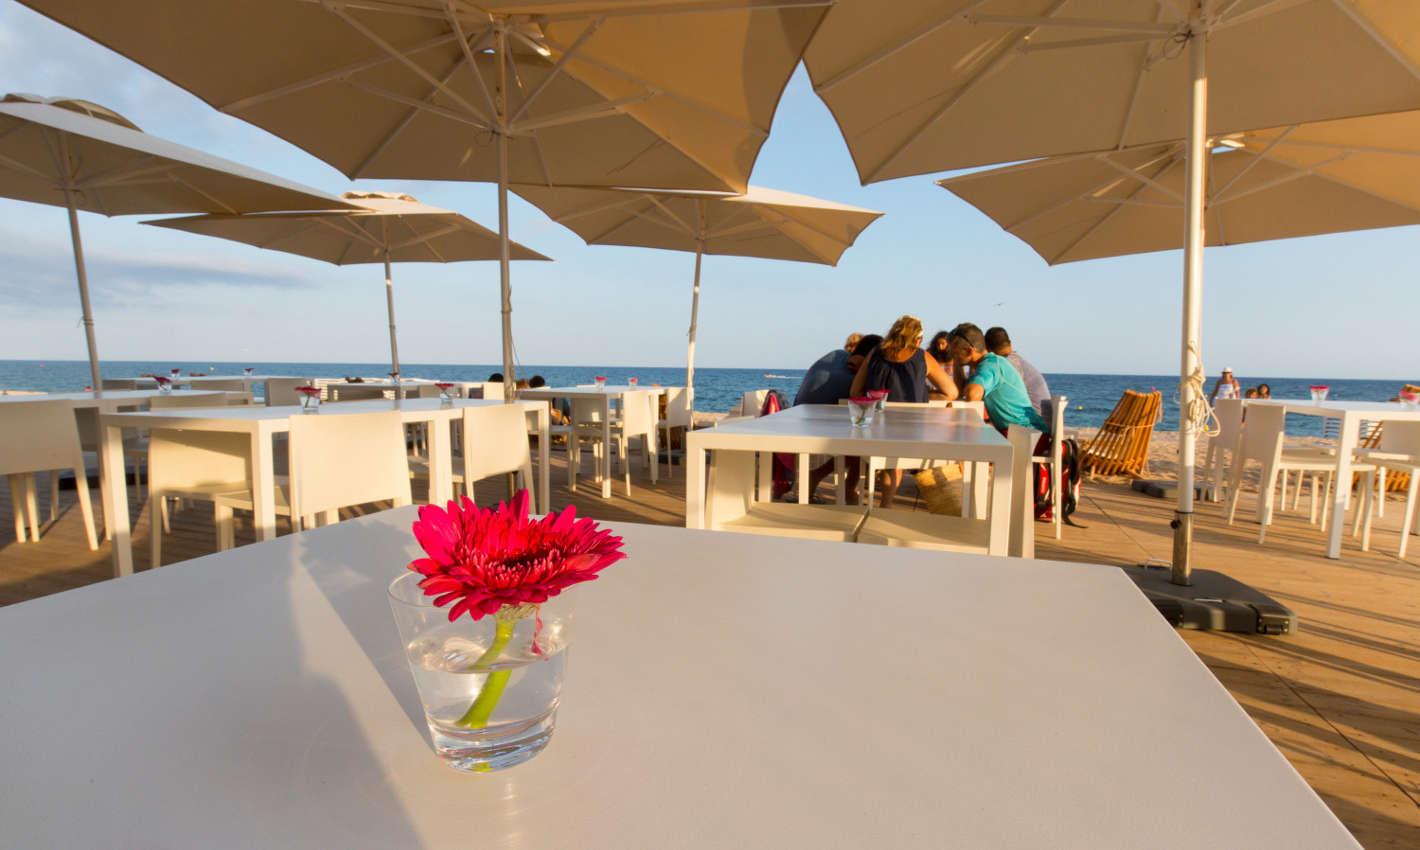 platja-garbi-terrassa-guinguetes